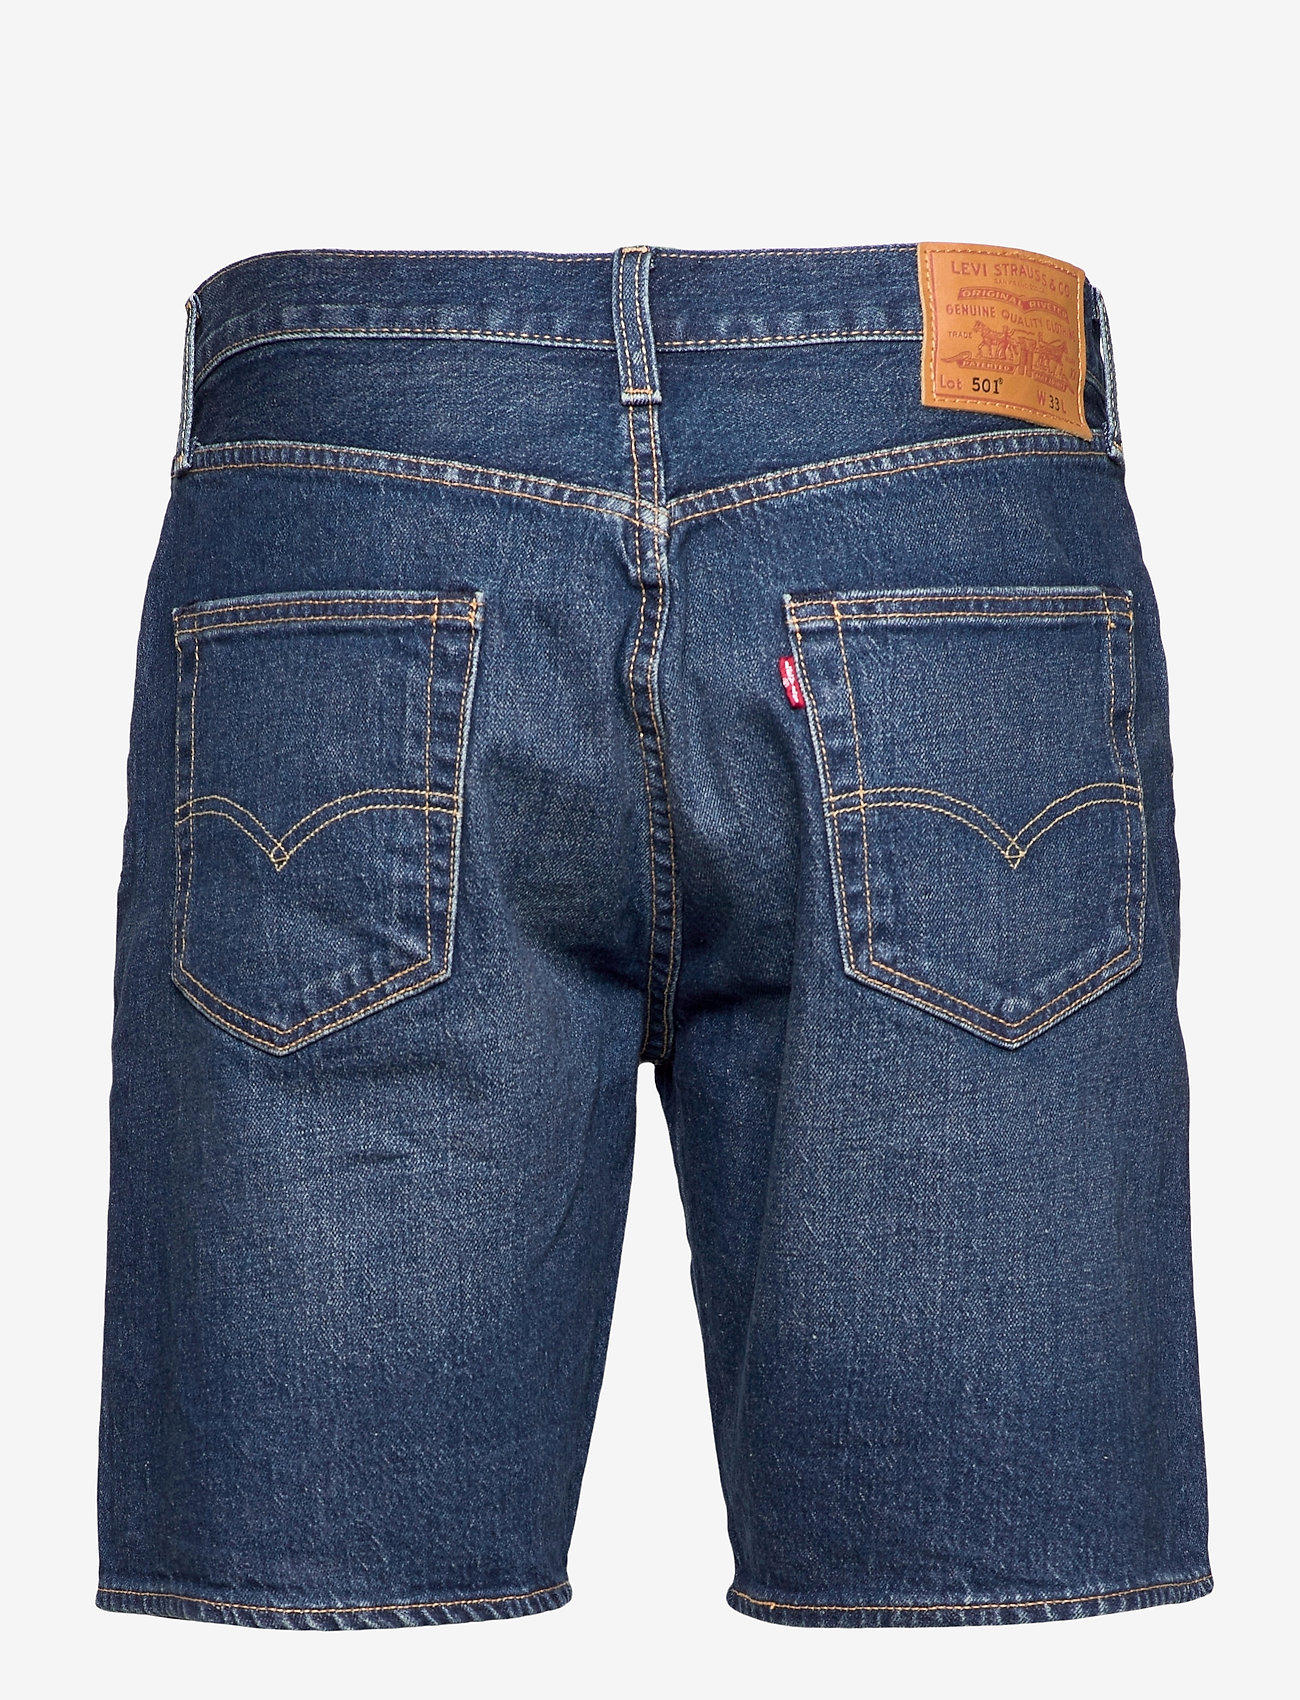 LEVI´S Men - 501 HEMMED SHORT FIRE GOIN SHO - jeansowe szorty - med indigo - flat finish - 1